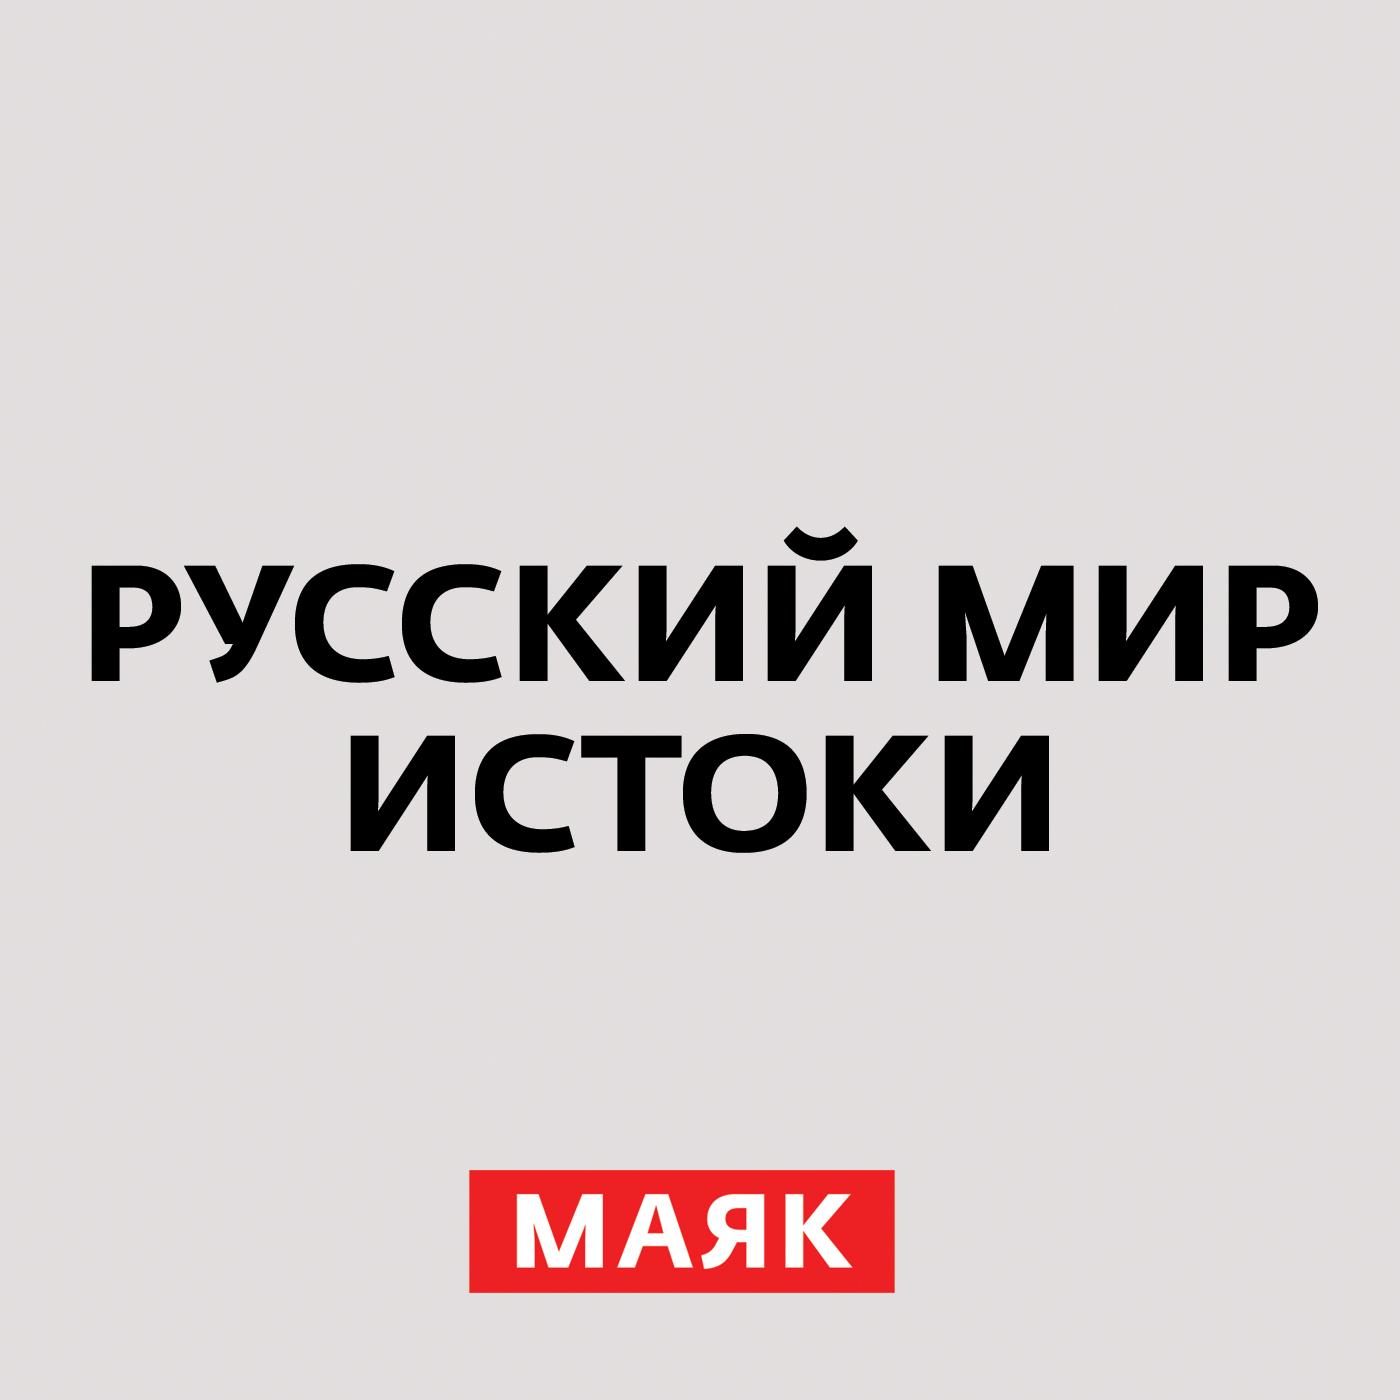 Творческий коллектив радио «Маяк» Правление Федора Иоанновича и Бориса Годунова творческий коллектив радио маяк теща